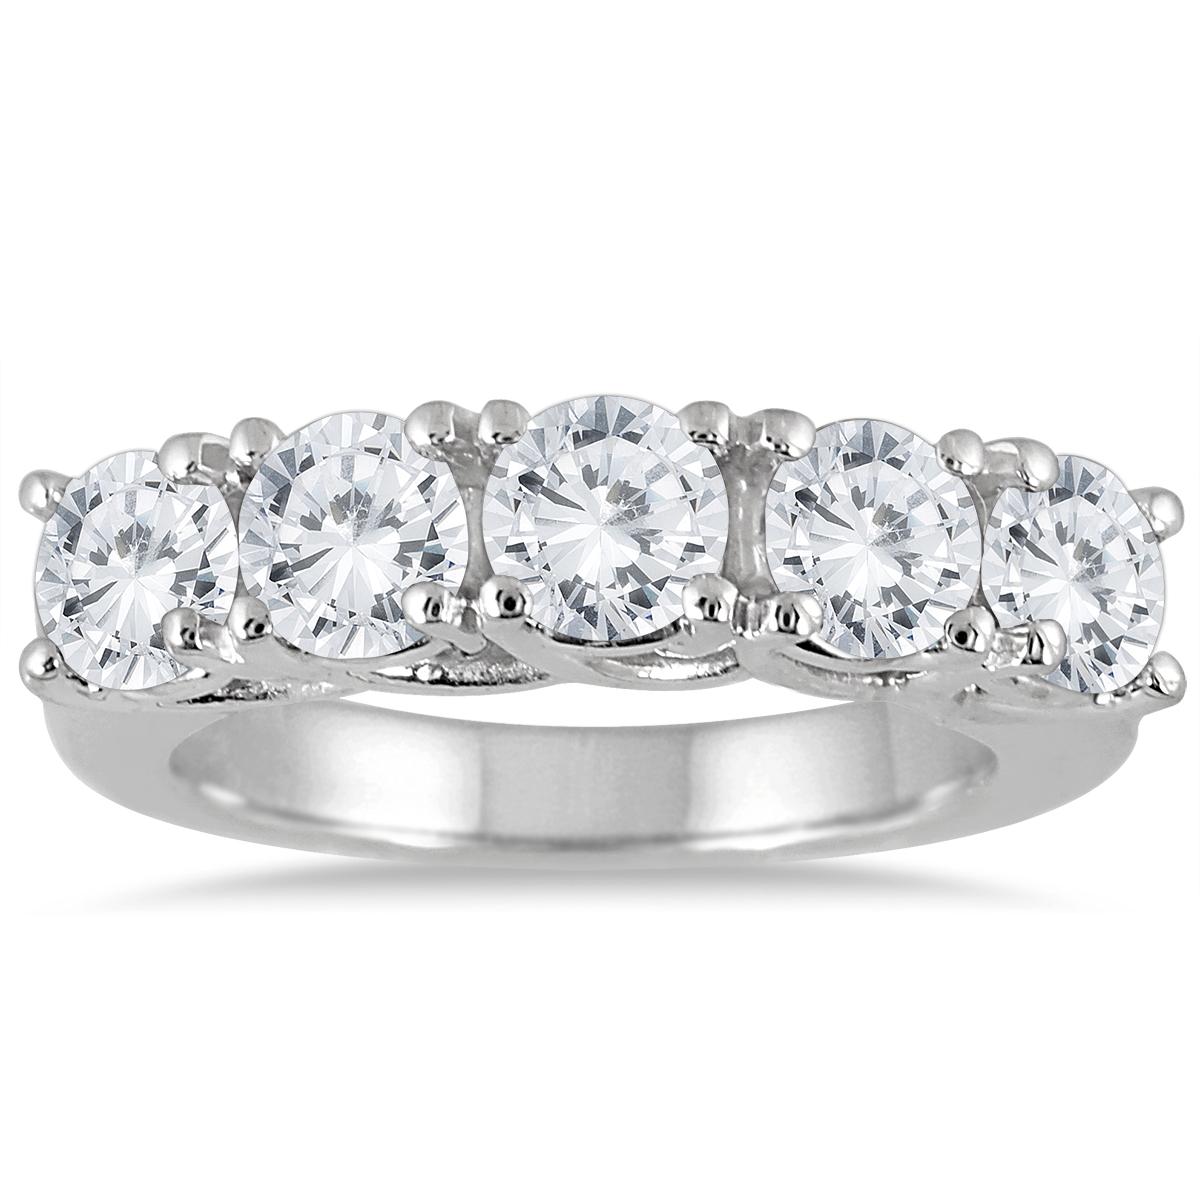 3 Carat TW Five Stone Diamond Wedding Band in 14K White Gold